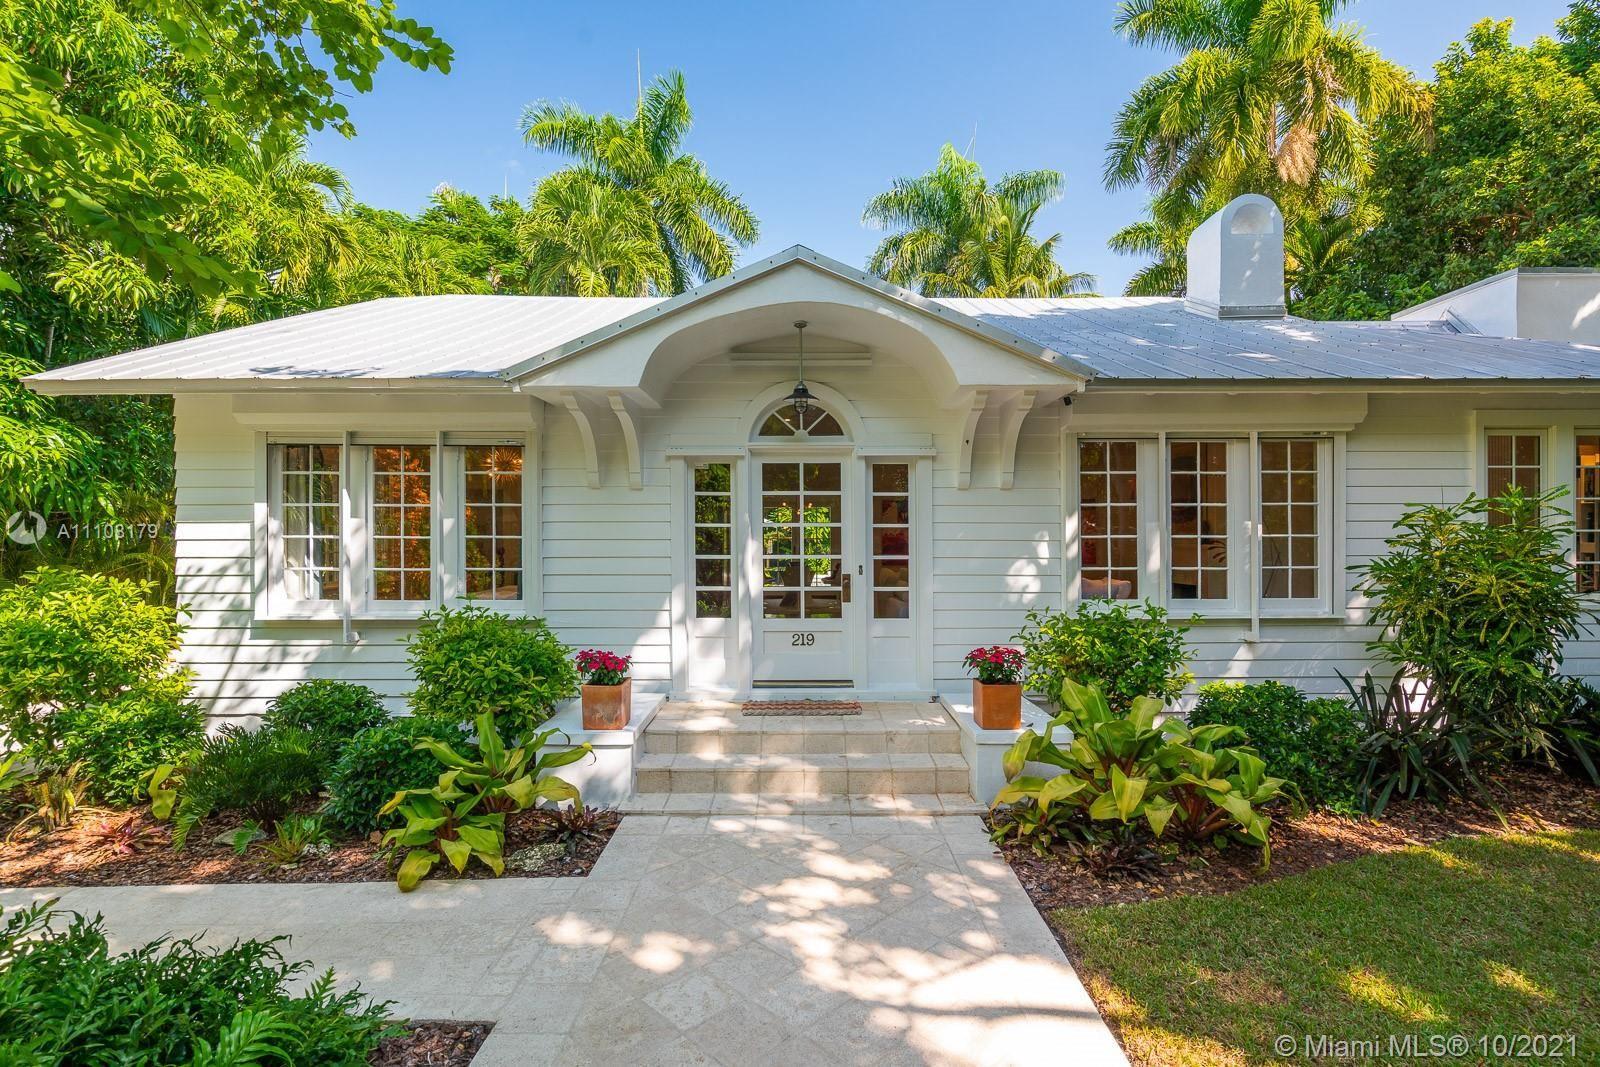 Photo of 219 Ridgewood Rd, Coral Gables, FL 33133 (MLS # A11108179)